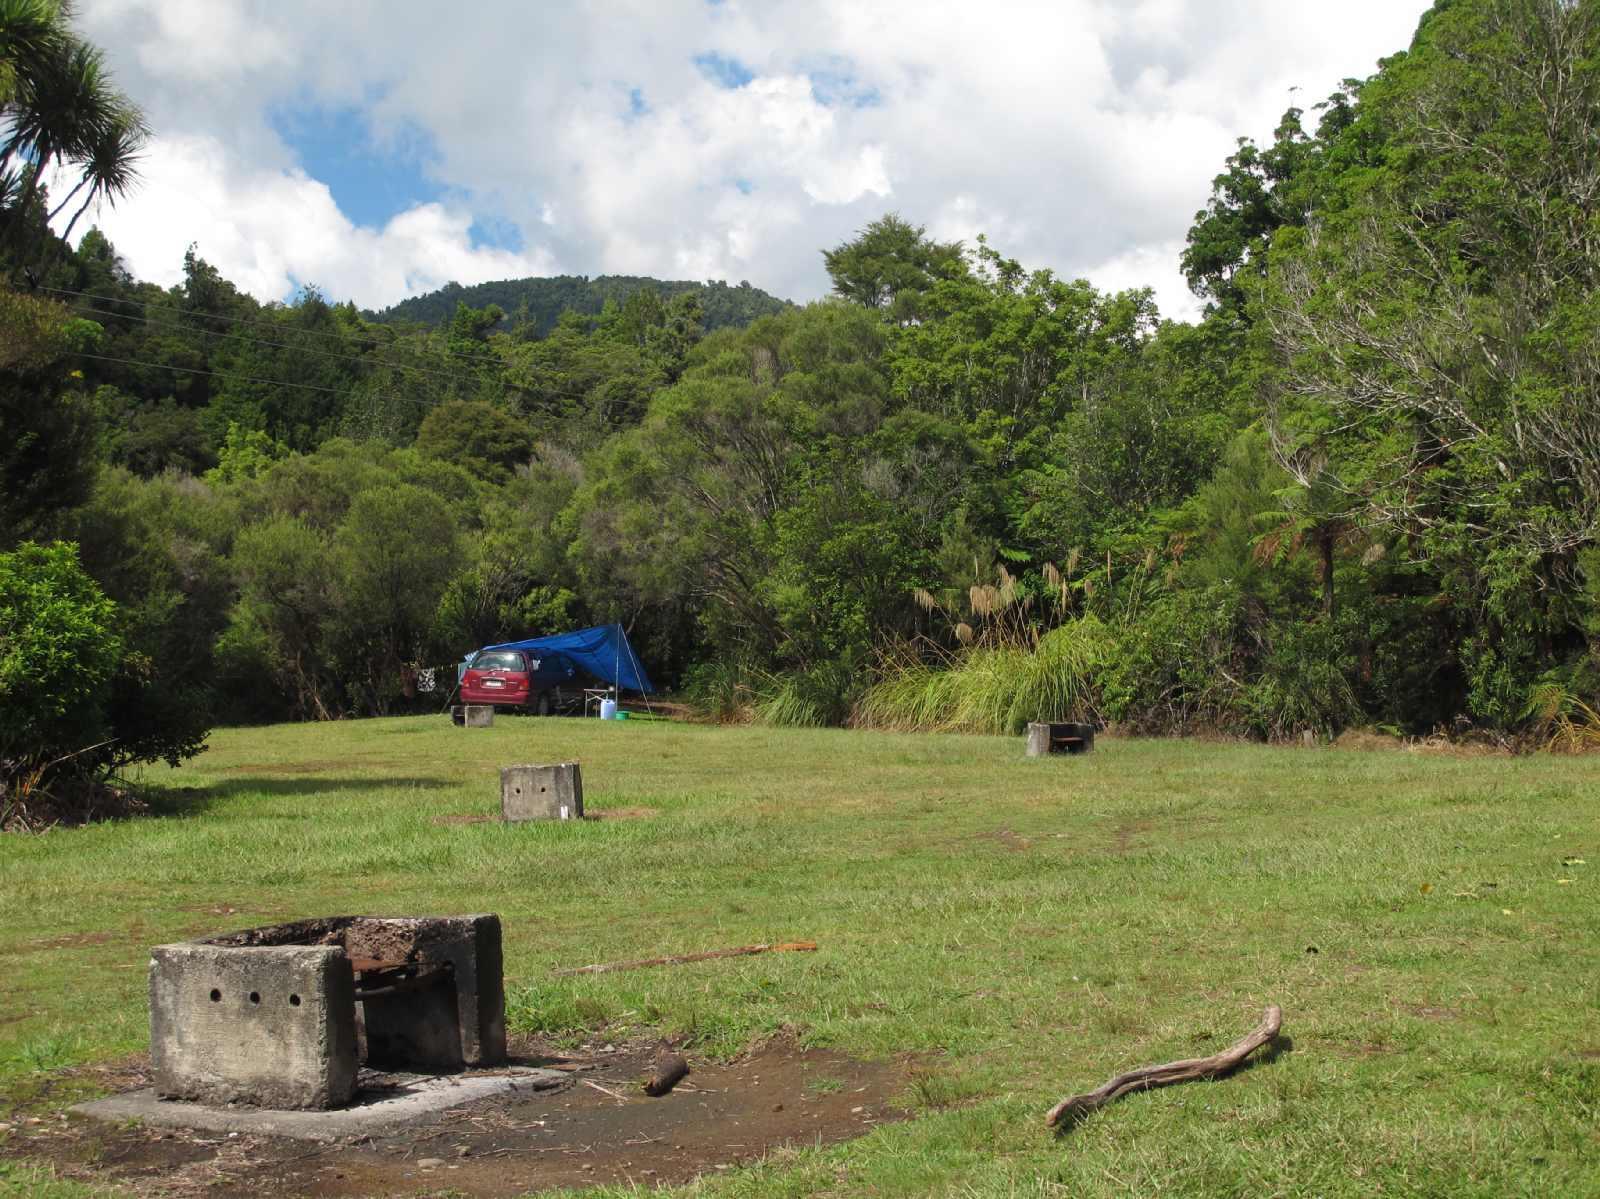 Trestle View Campsite